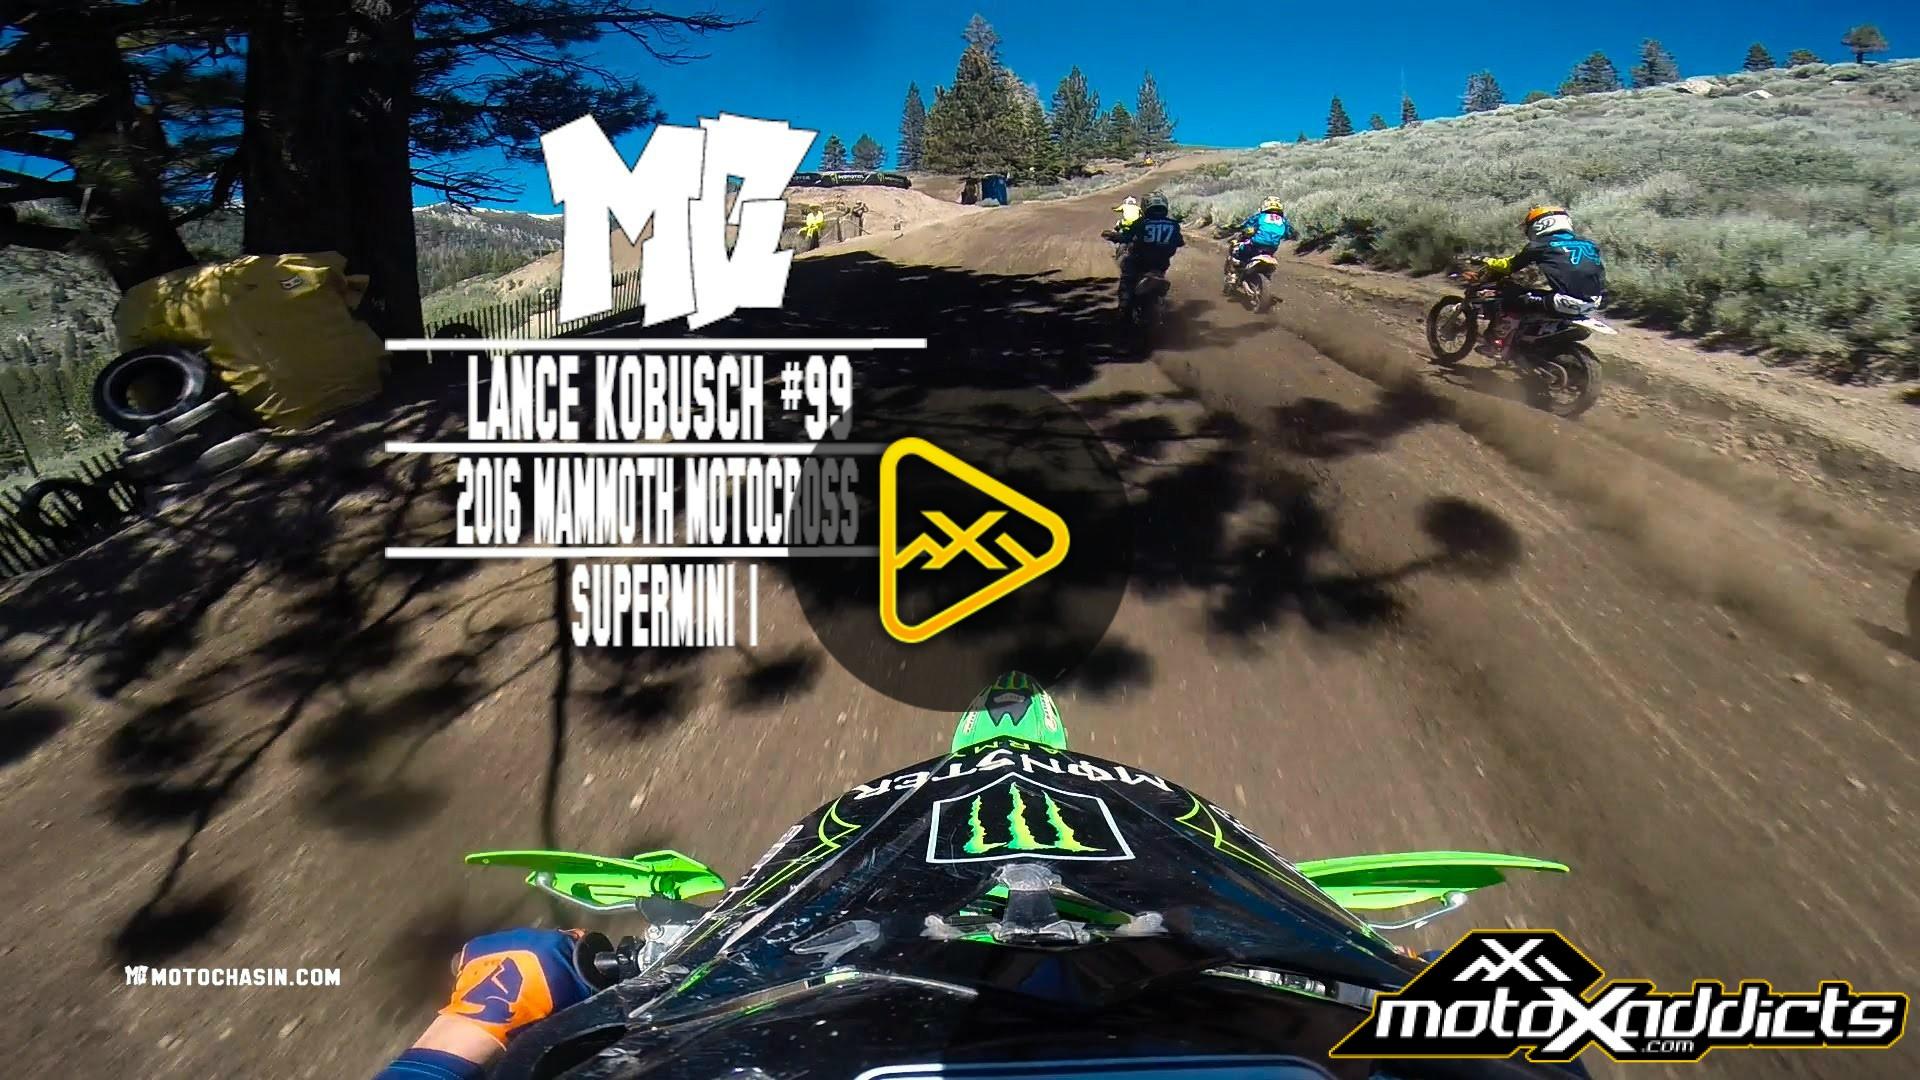 Helmet Cam: Lance Kobusch Pushes his Supermini at Mammoth MX